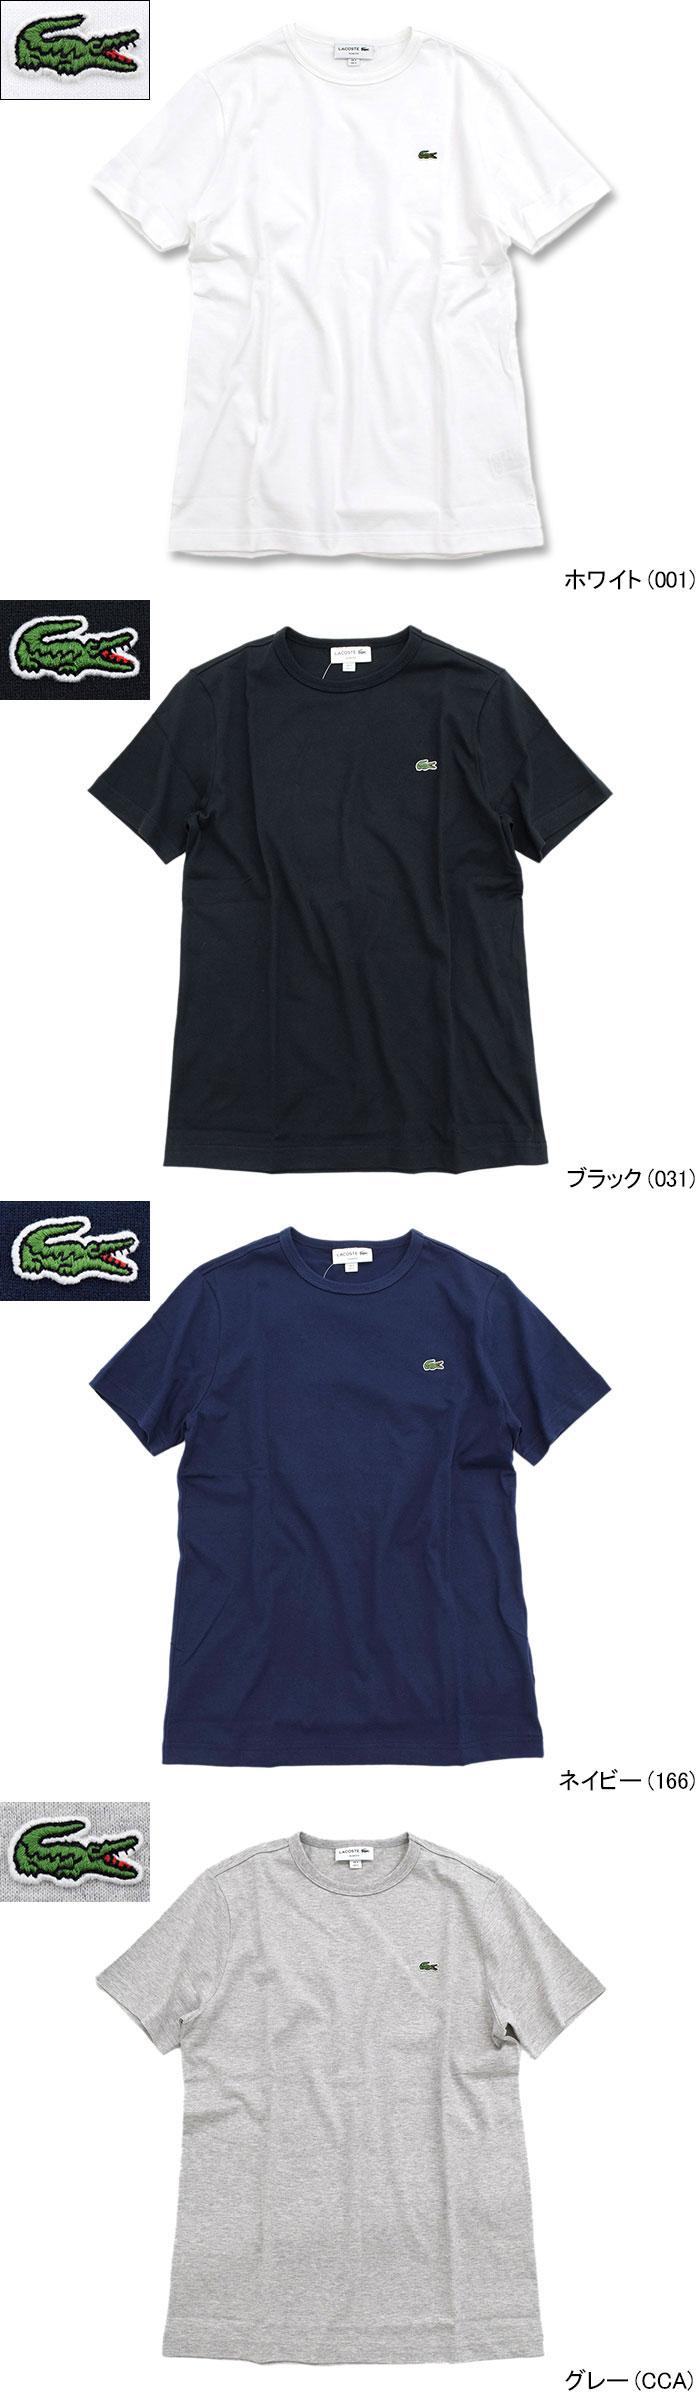 LACOSTEラコステのTシャツ TH5845L Basic Crew Neck14